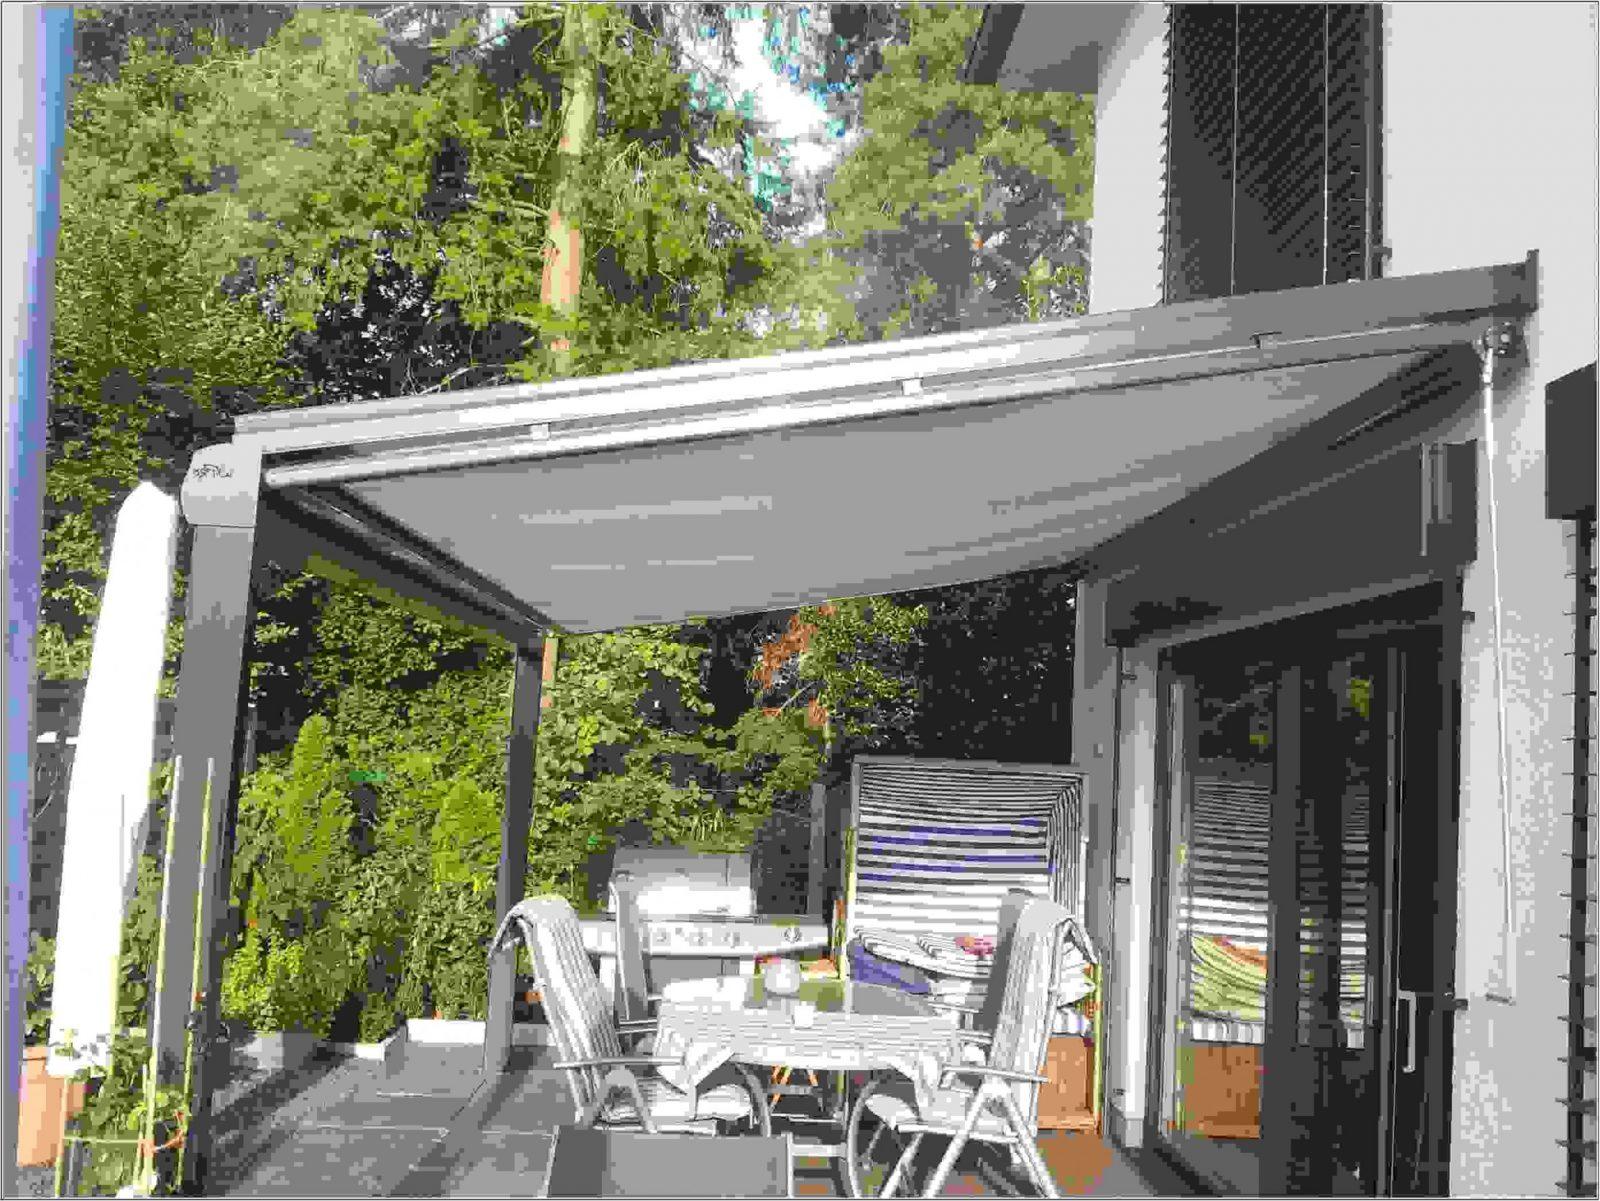 Schön Terrassenüberdachung Alu Selber Bauen Elegant Ist Das Beste von Terrassenüberdachung Günstig Selber Bauen Bild